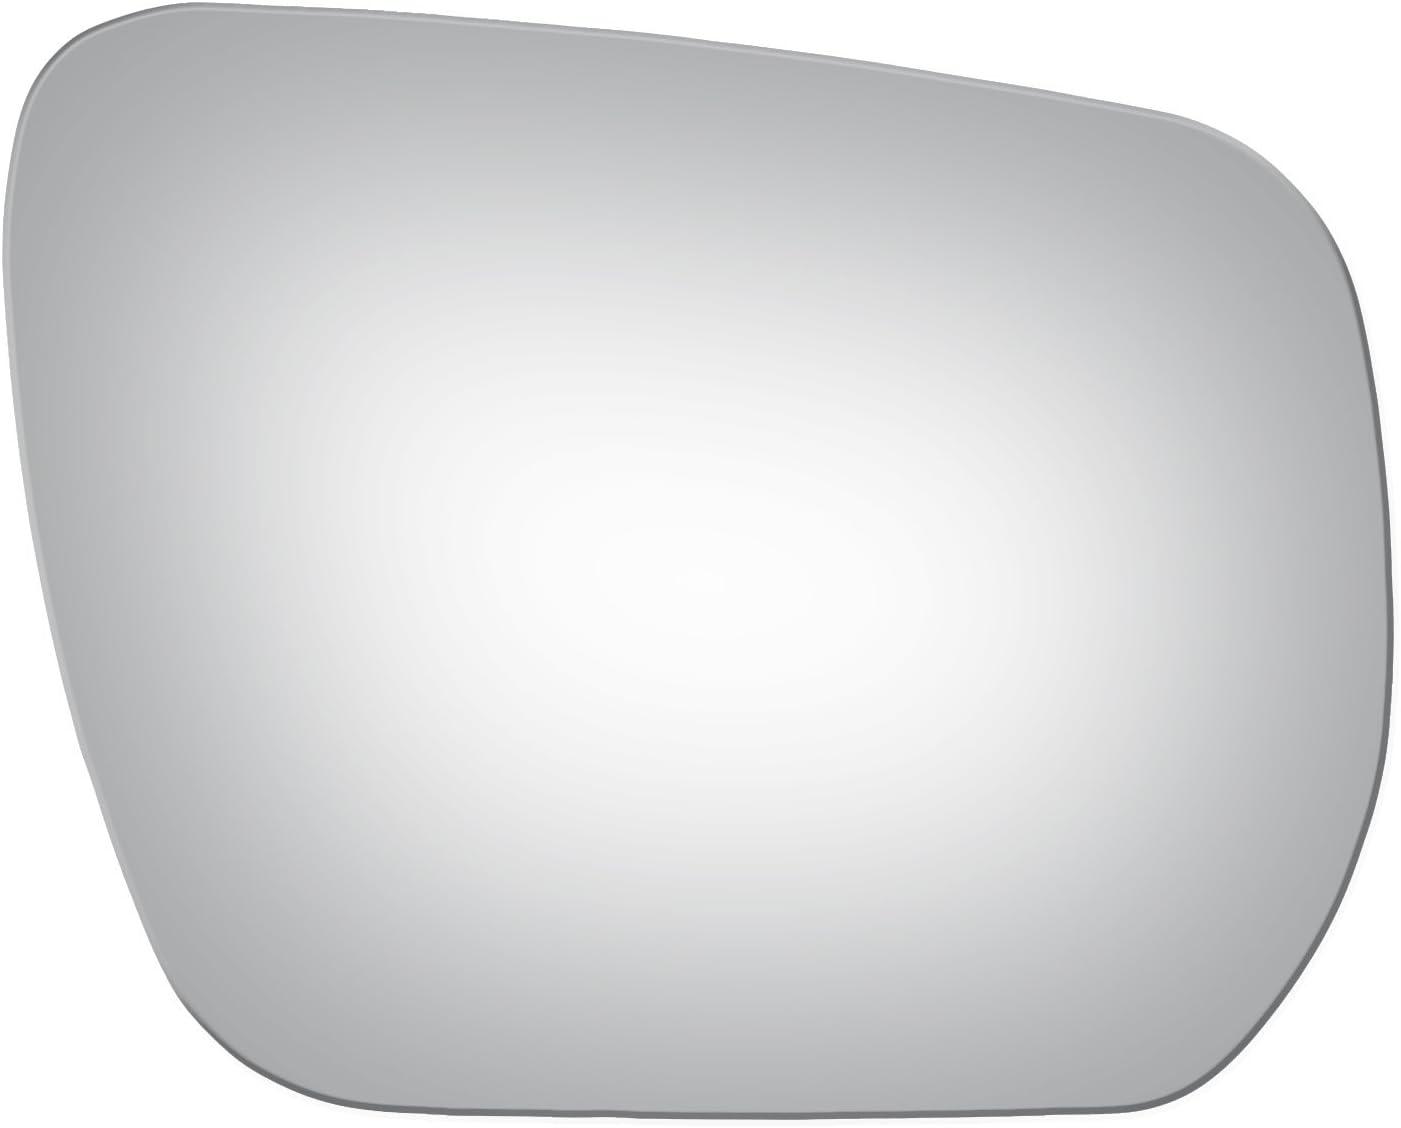 Flat Driver Left Side Replacement Mirror Glass for 2006-2011 Suzuki Vitara-Grand Vitara